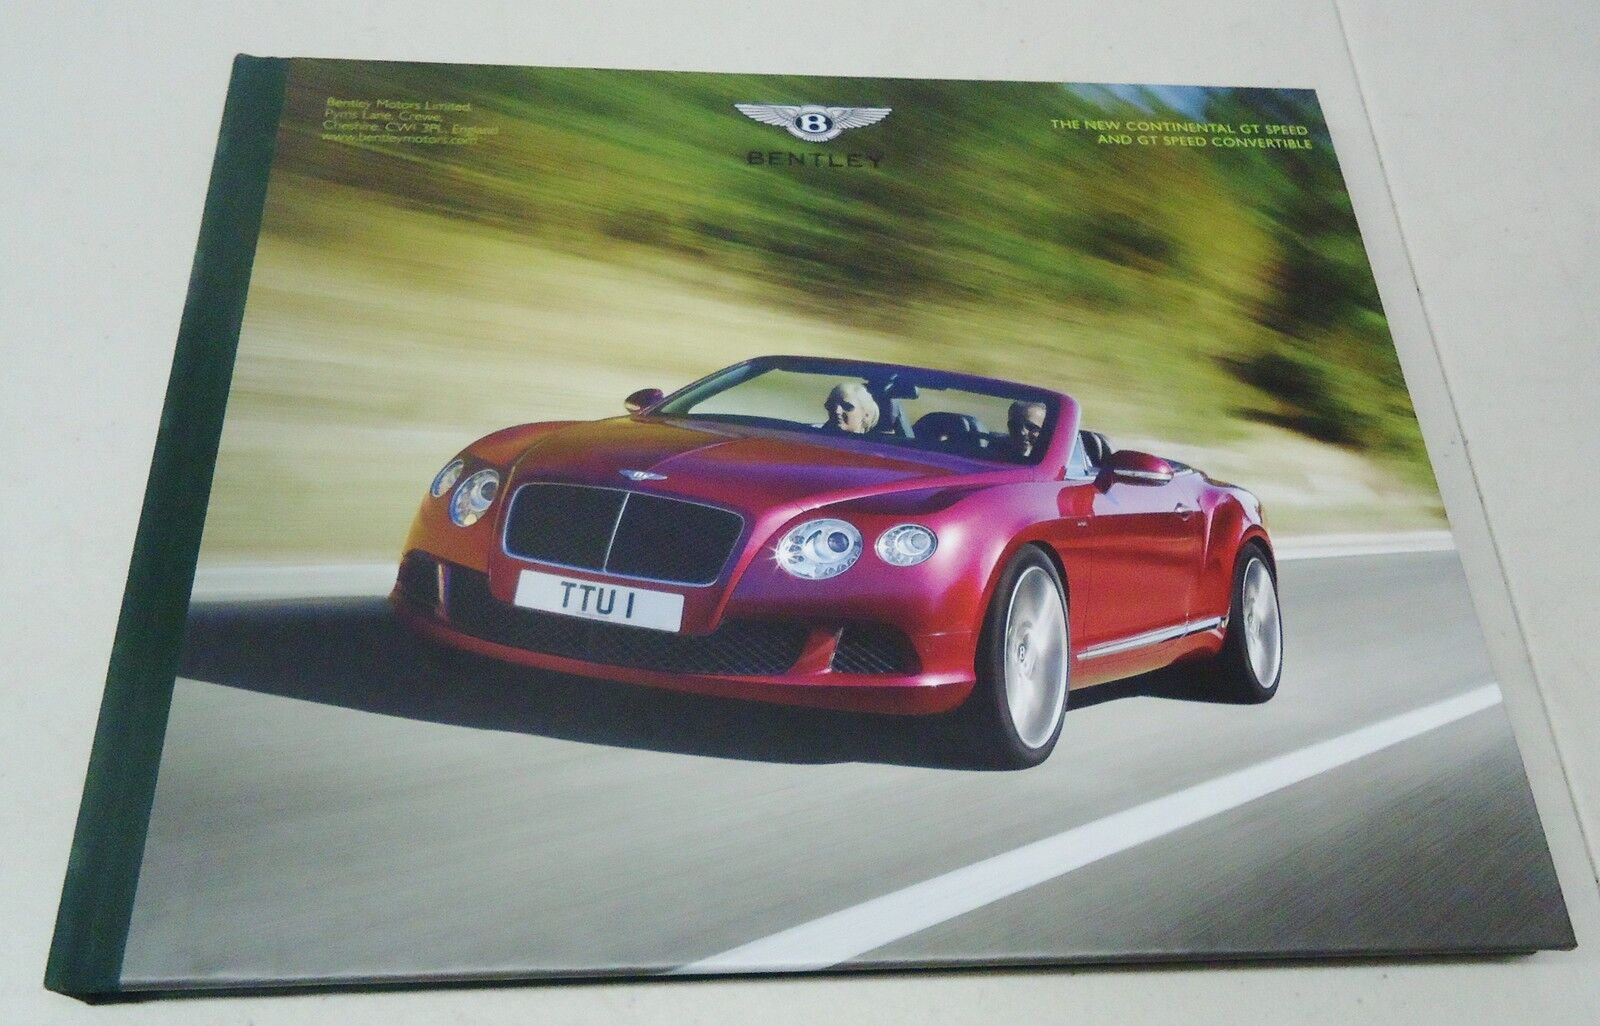 Pleasant Bentley The Continental Gt Speed And Gt Speed Congreenible Dealer Wiring Digital Resources Skatpmognl